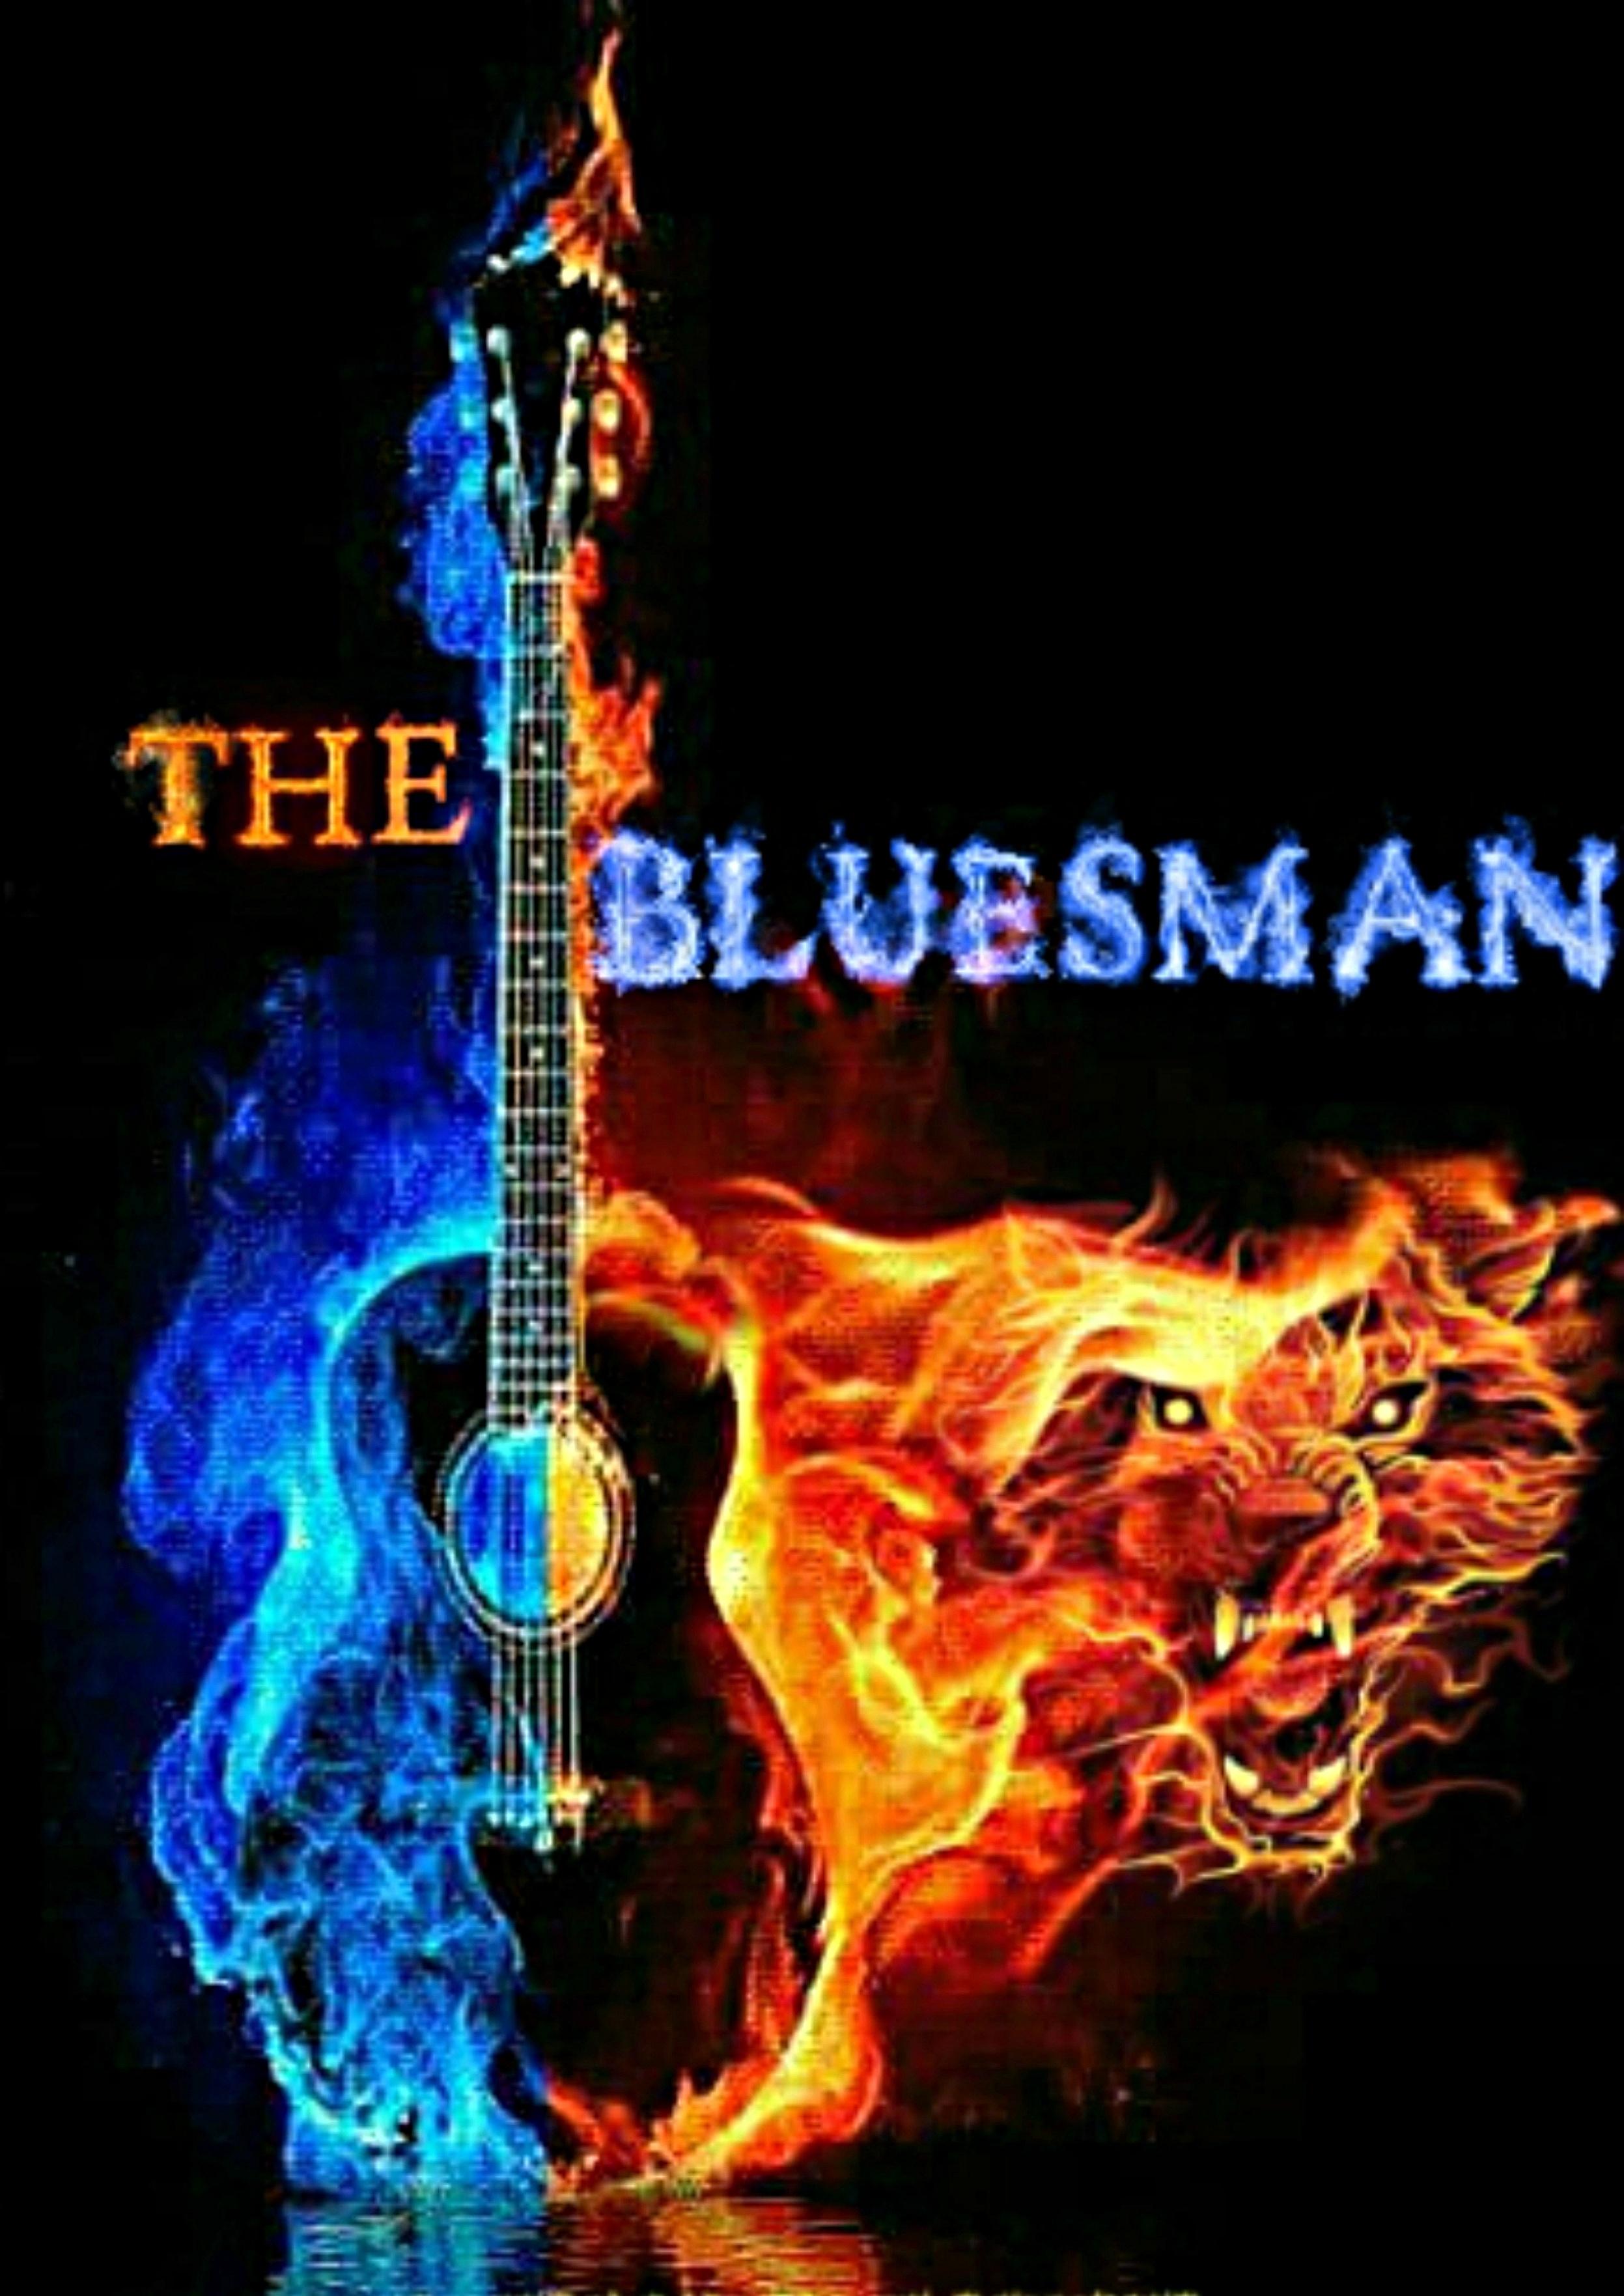 thebluesmanmovie Cover